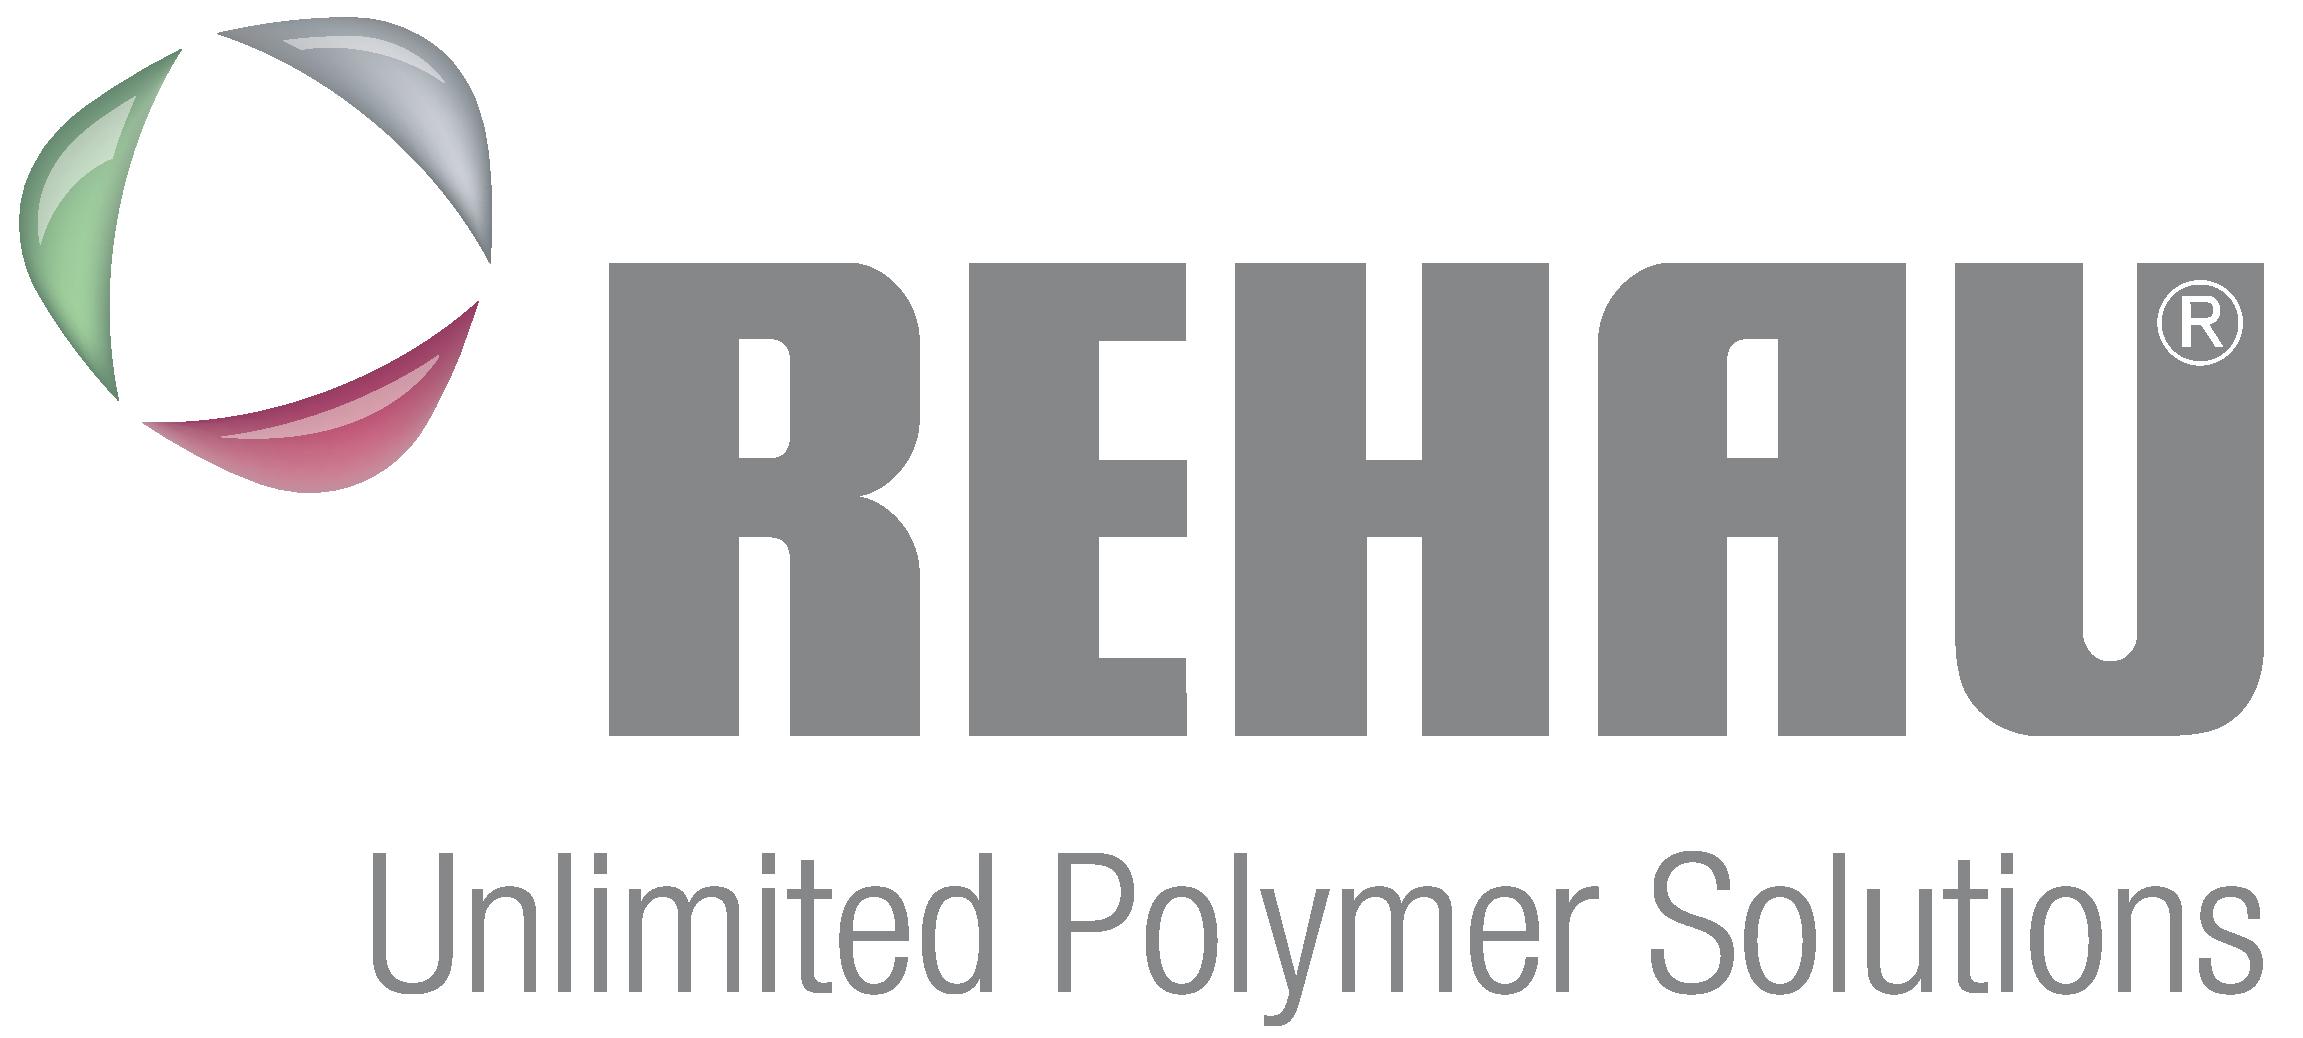 rehau-logo.jpg